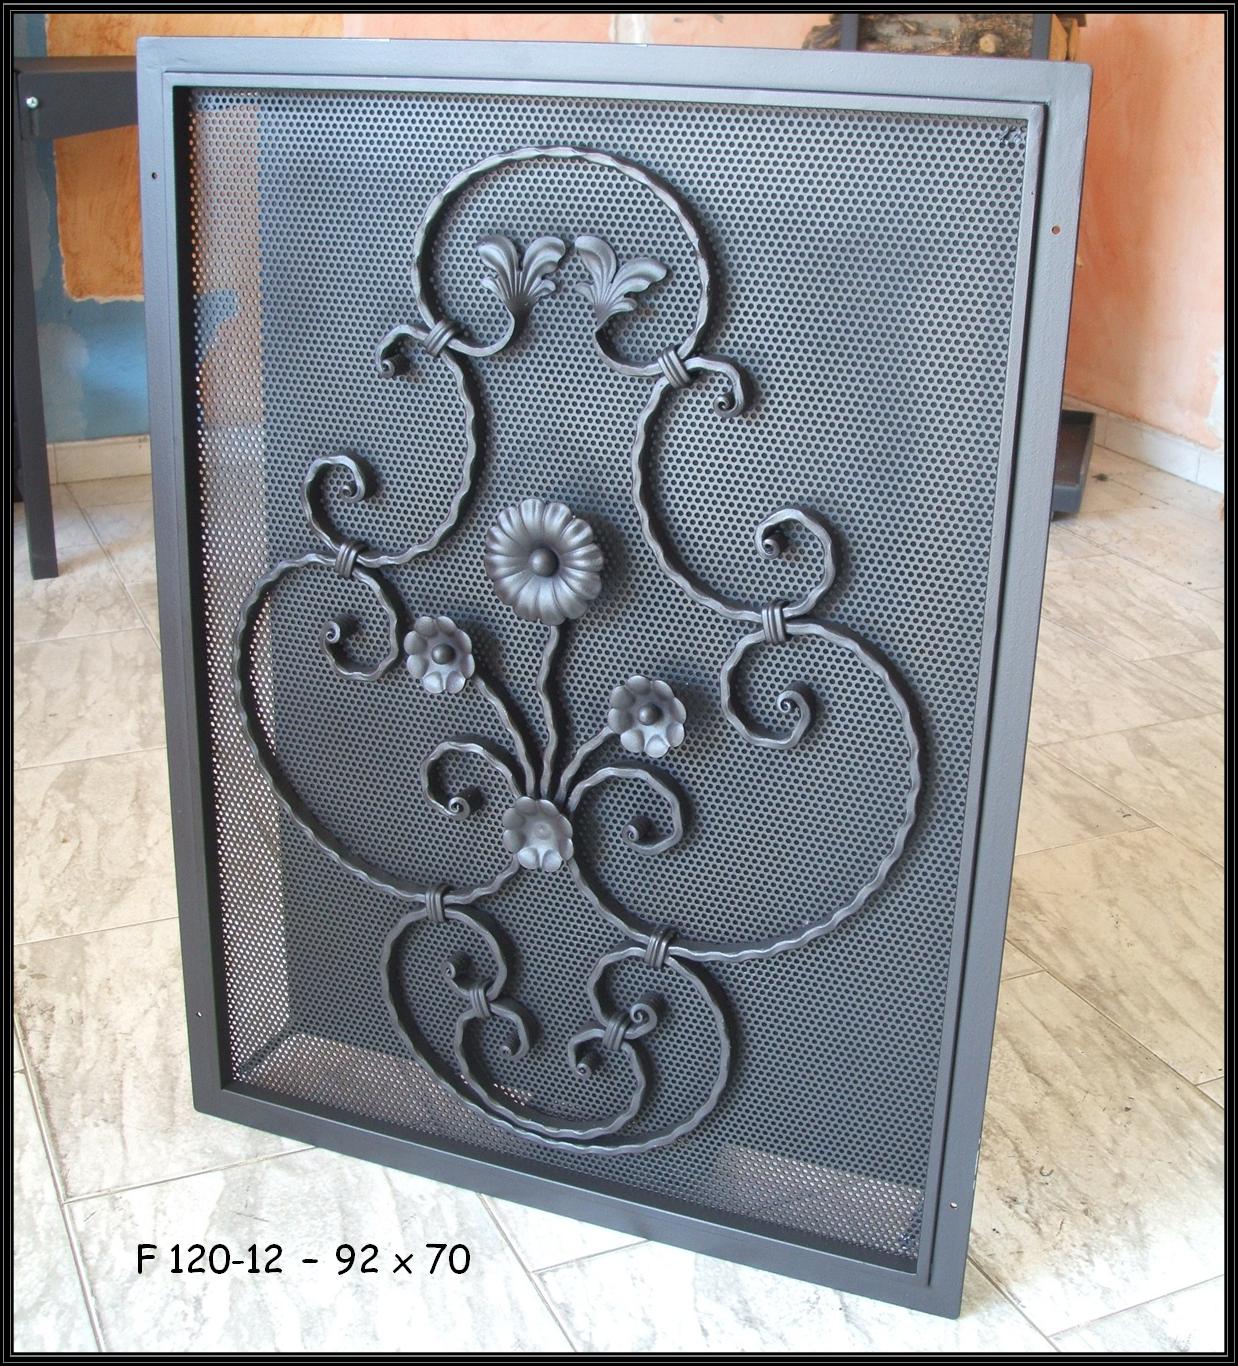 Chimeneas sierra rejillas decorativas para chimeneas - Accesorios de chimeneas ...